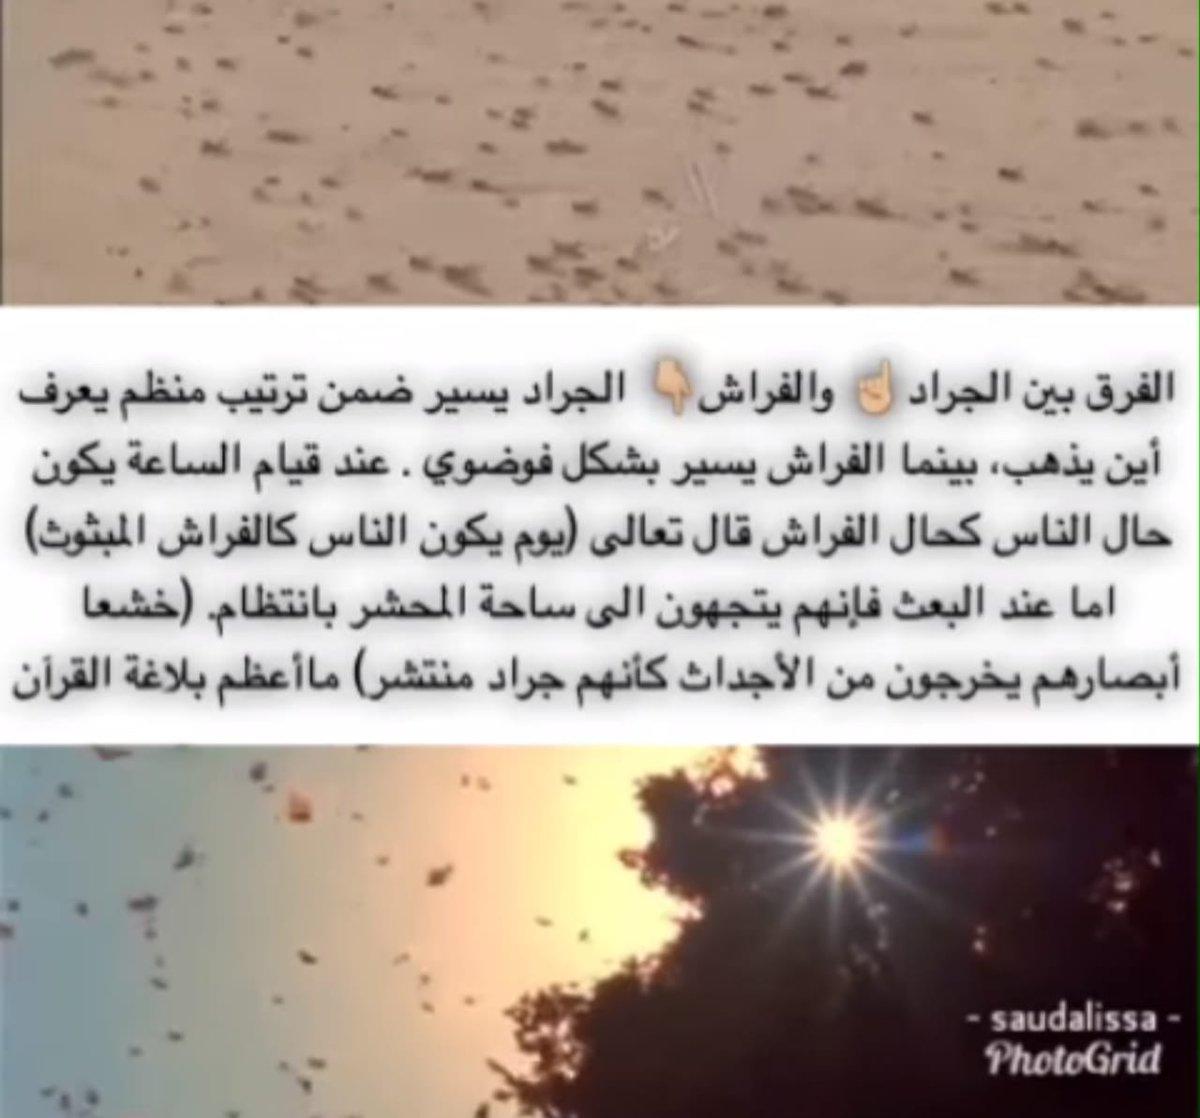 df2d03843 #القران_الكريم ما أعظم بلاغة القرآن!! #غرد_بصورةpic.twitter.com/t3Ab7bbFxf